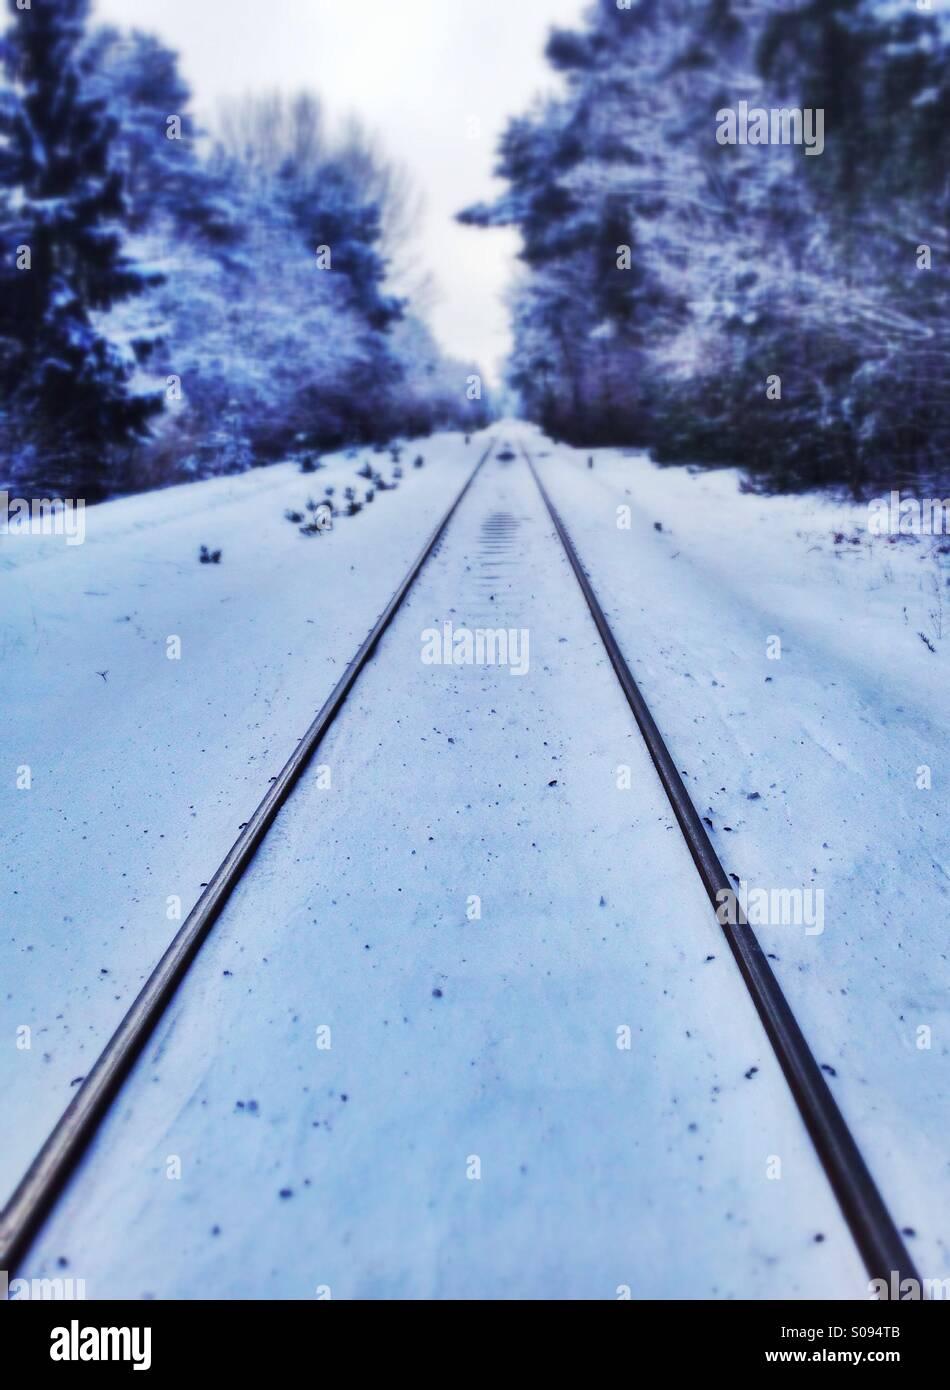 Snow on rail tracks - Stock Image